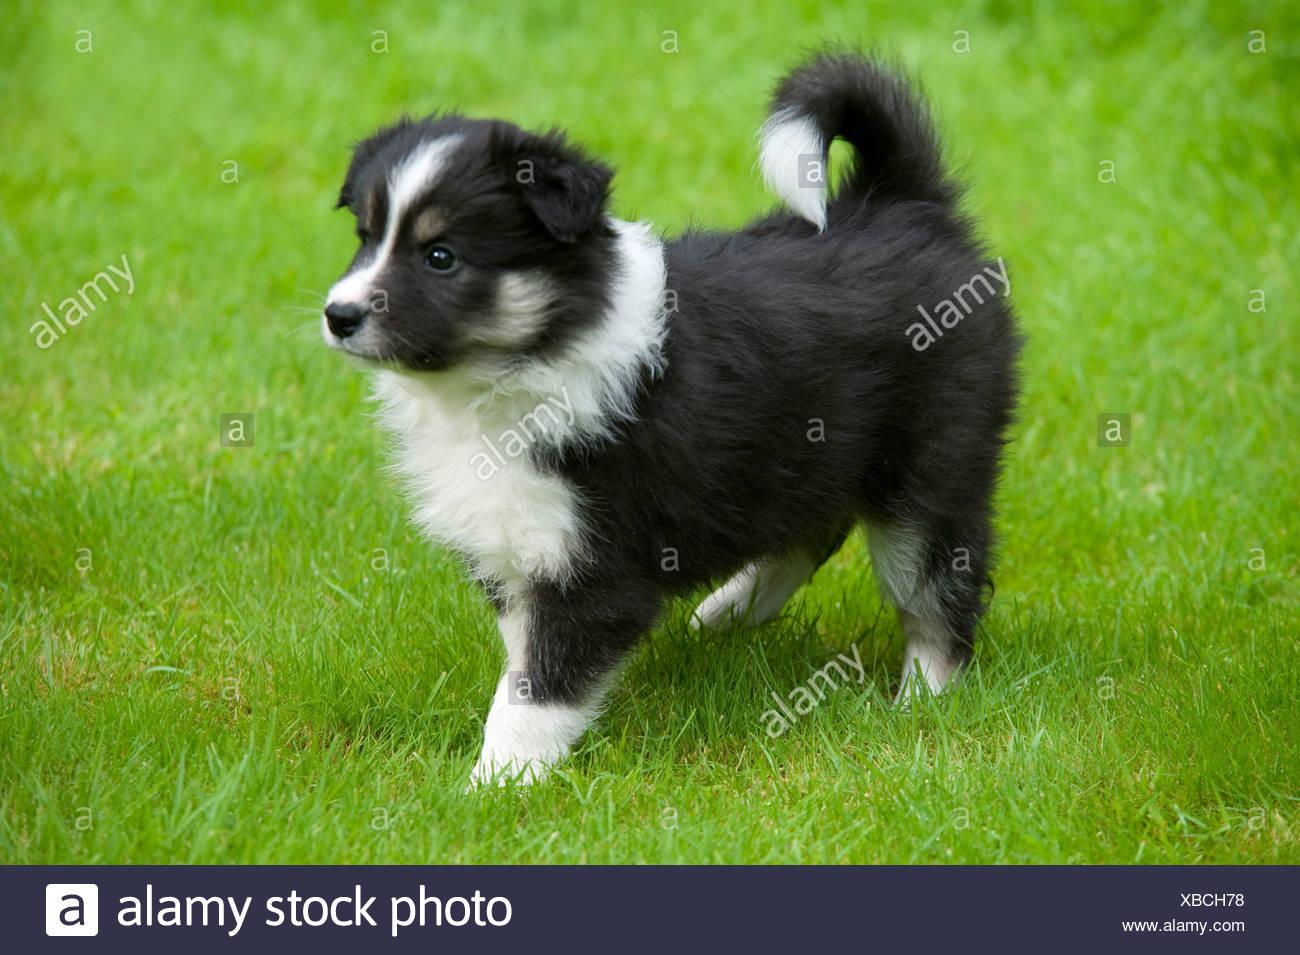 Border Collie Dog Puppy in garden UK - Stock Image